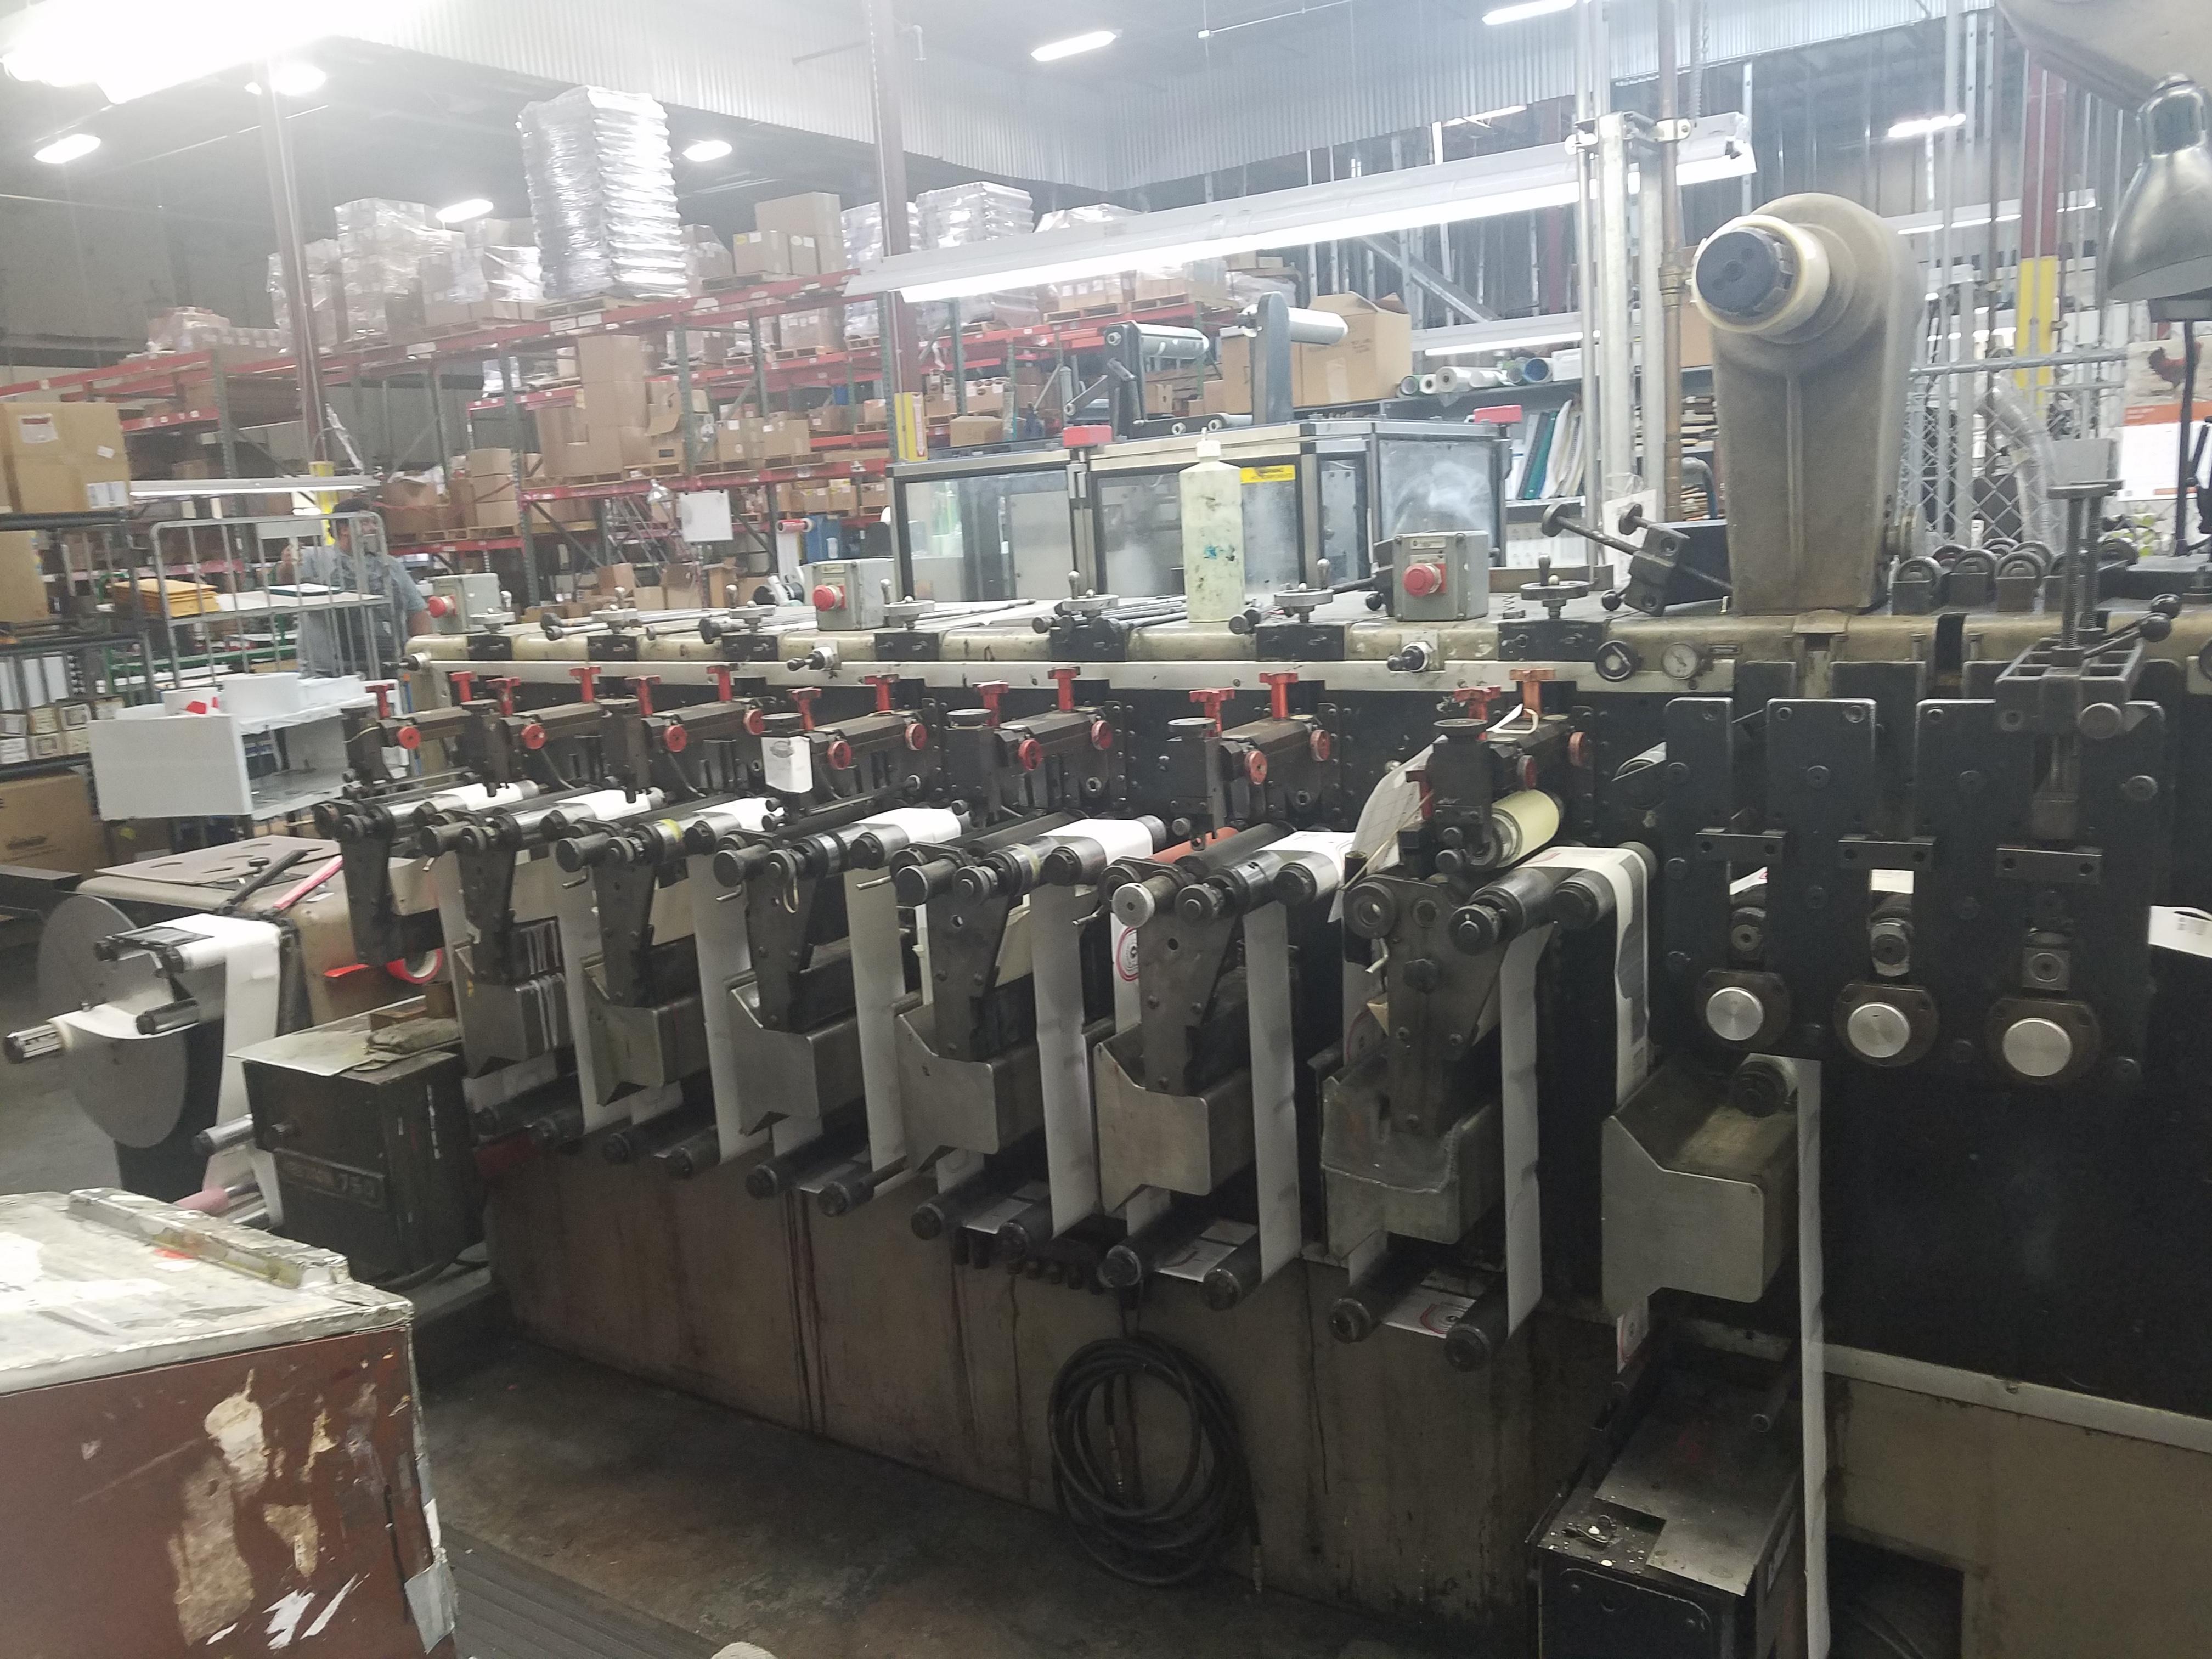 Webtron 750 - Used Flexo Printing Presses and Used Flexographic Equipment-3